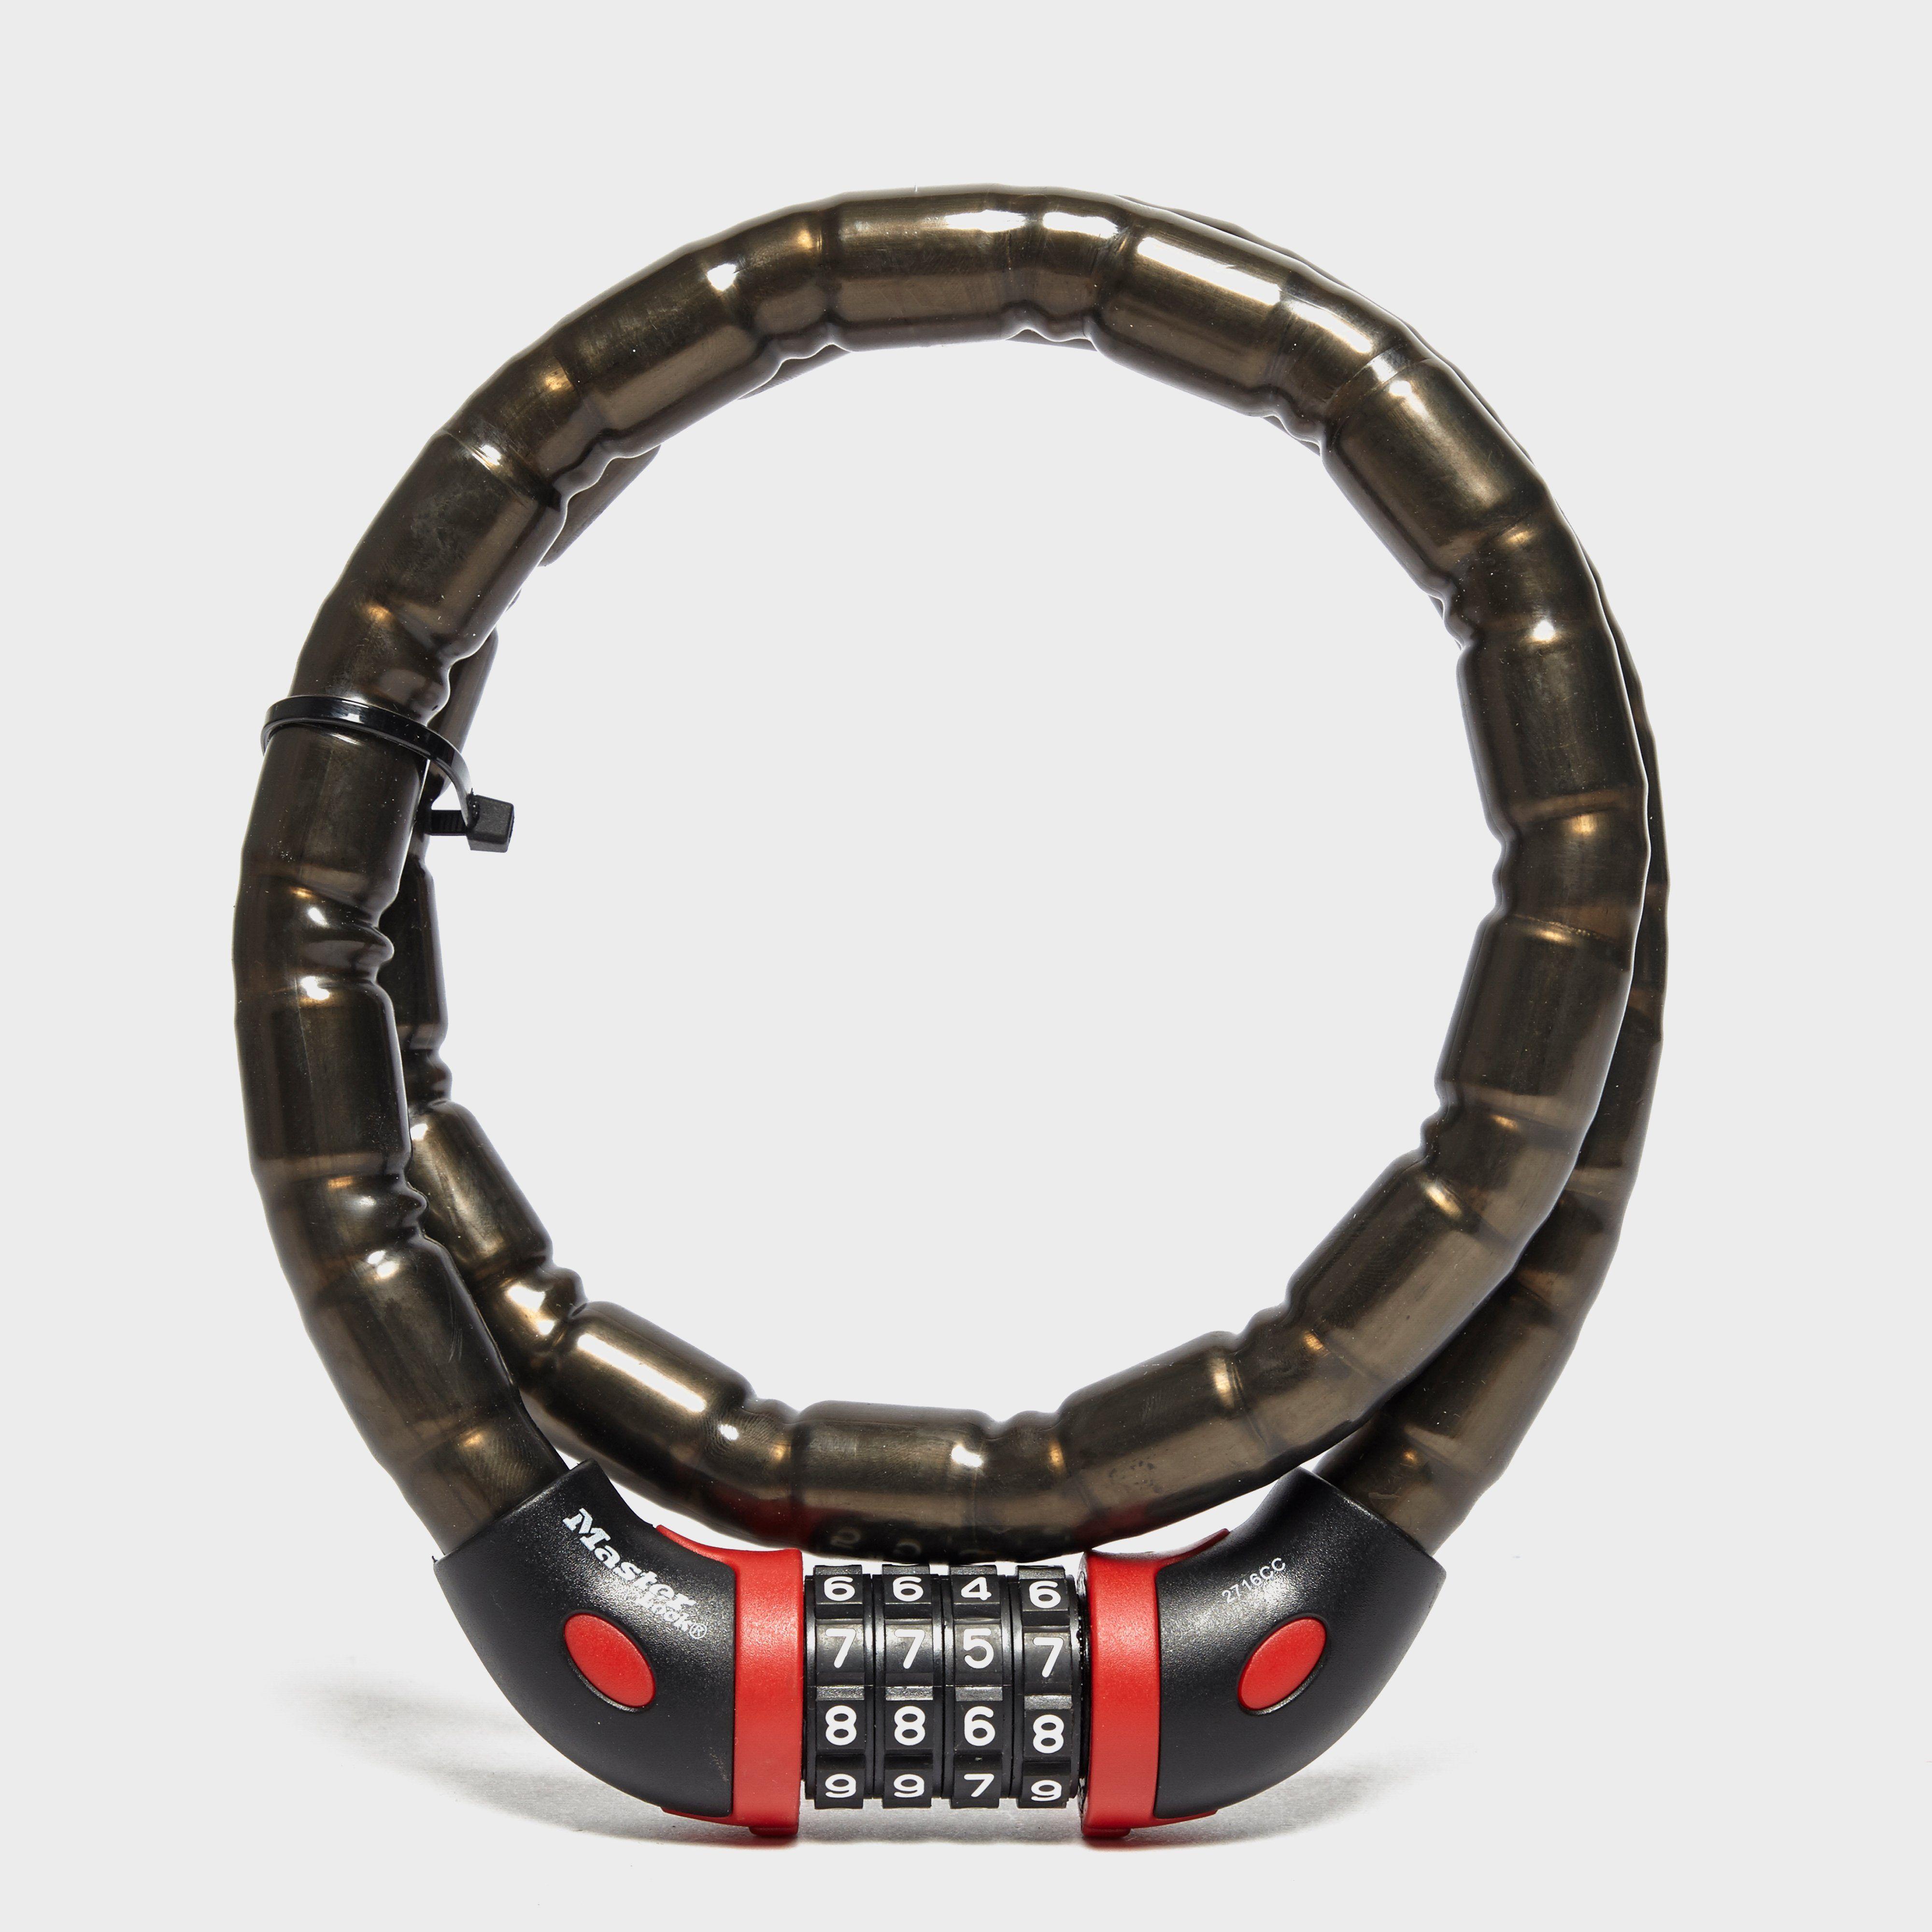 MASTERLOCK 4 Digit Combination Lock and Bracket